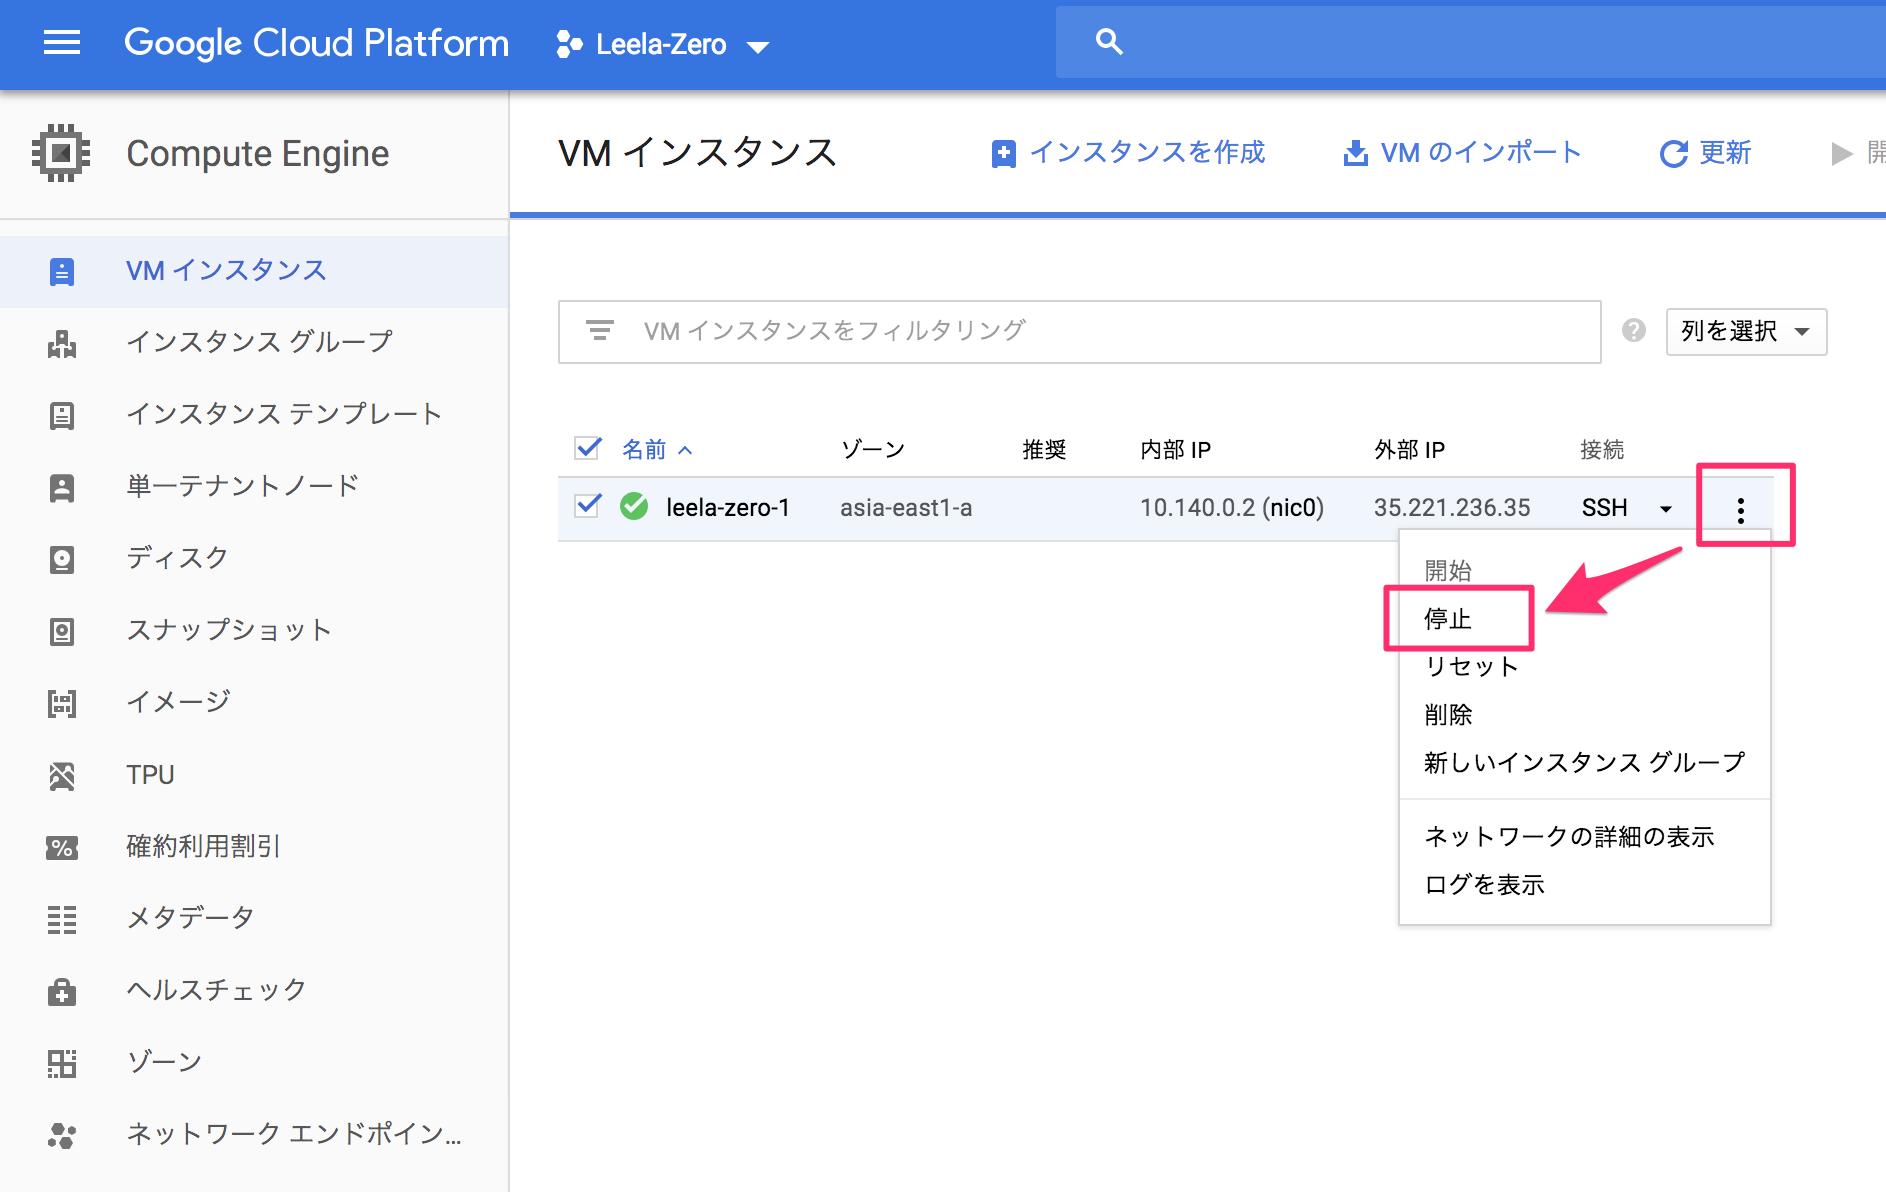 Compute_Engine_-_Leela-Zero_-_Google_Cloud_Platform.png